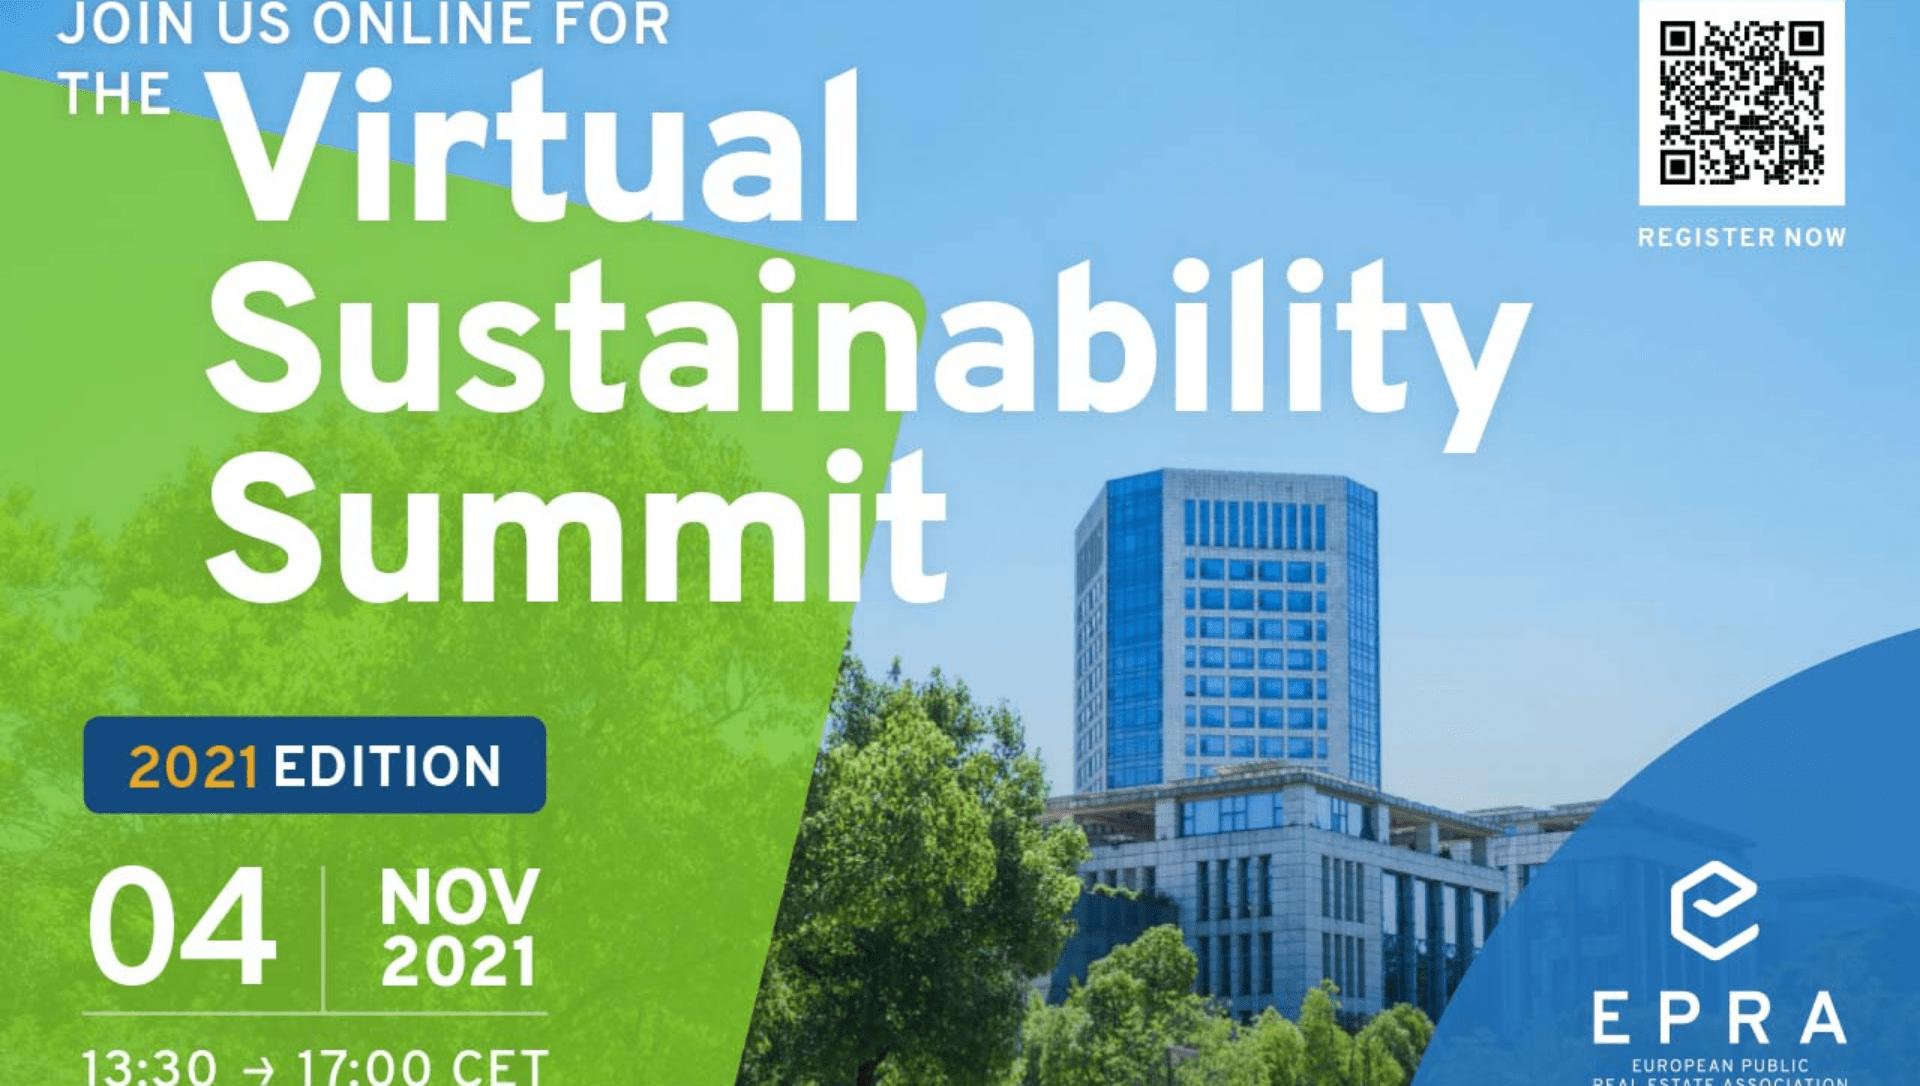 Sustainability Summit 2021 homepage slider 19201086 (1).png